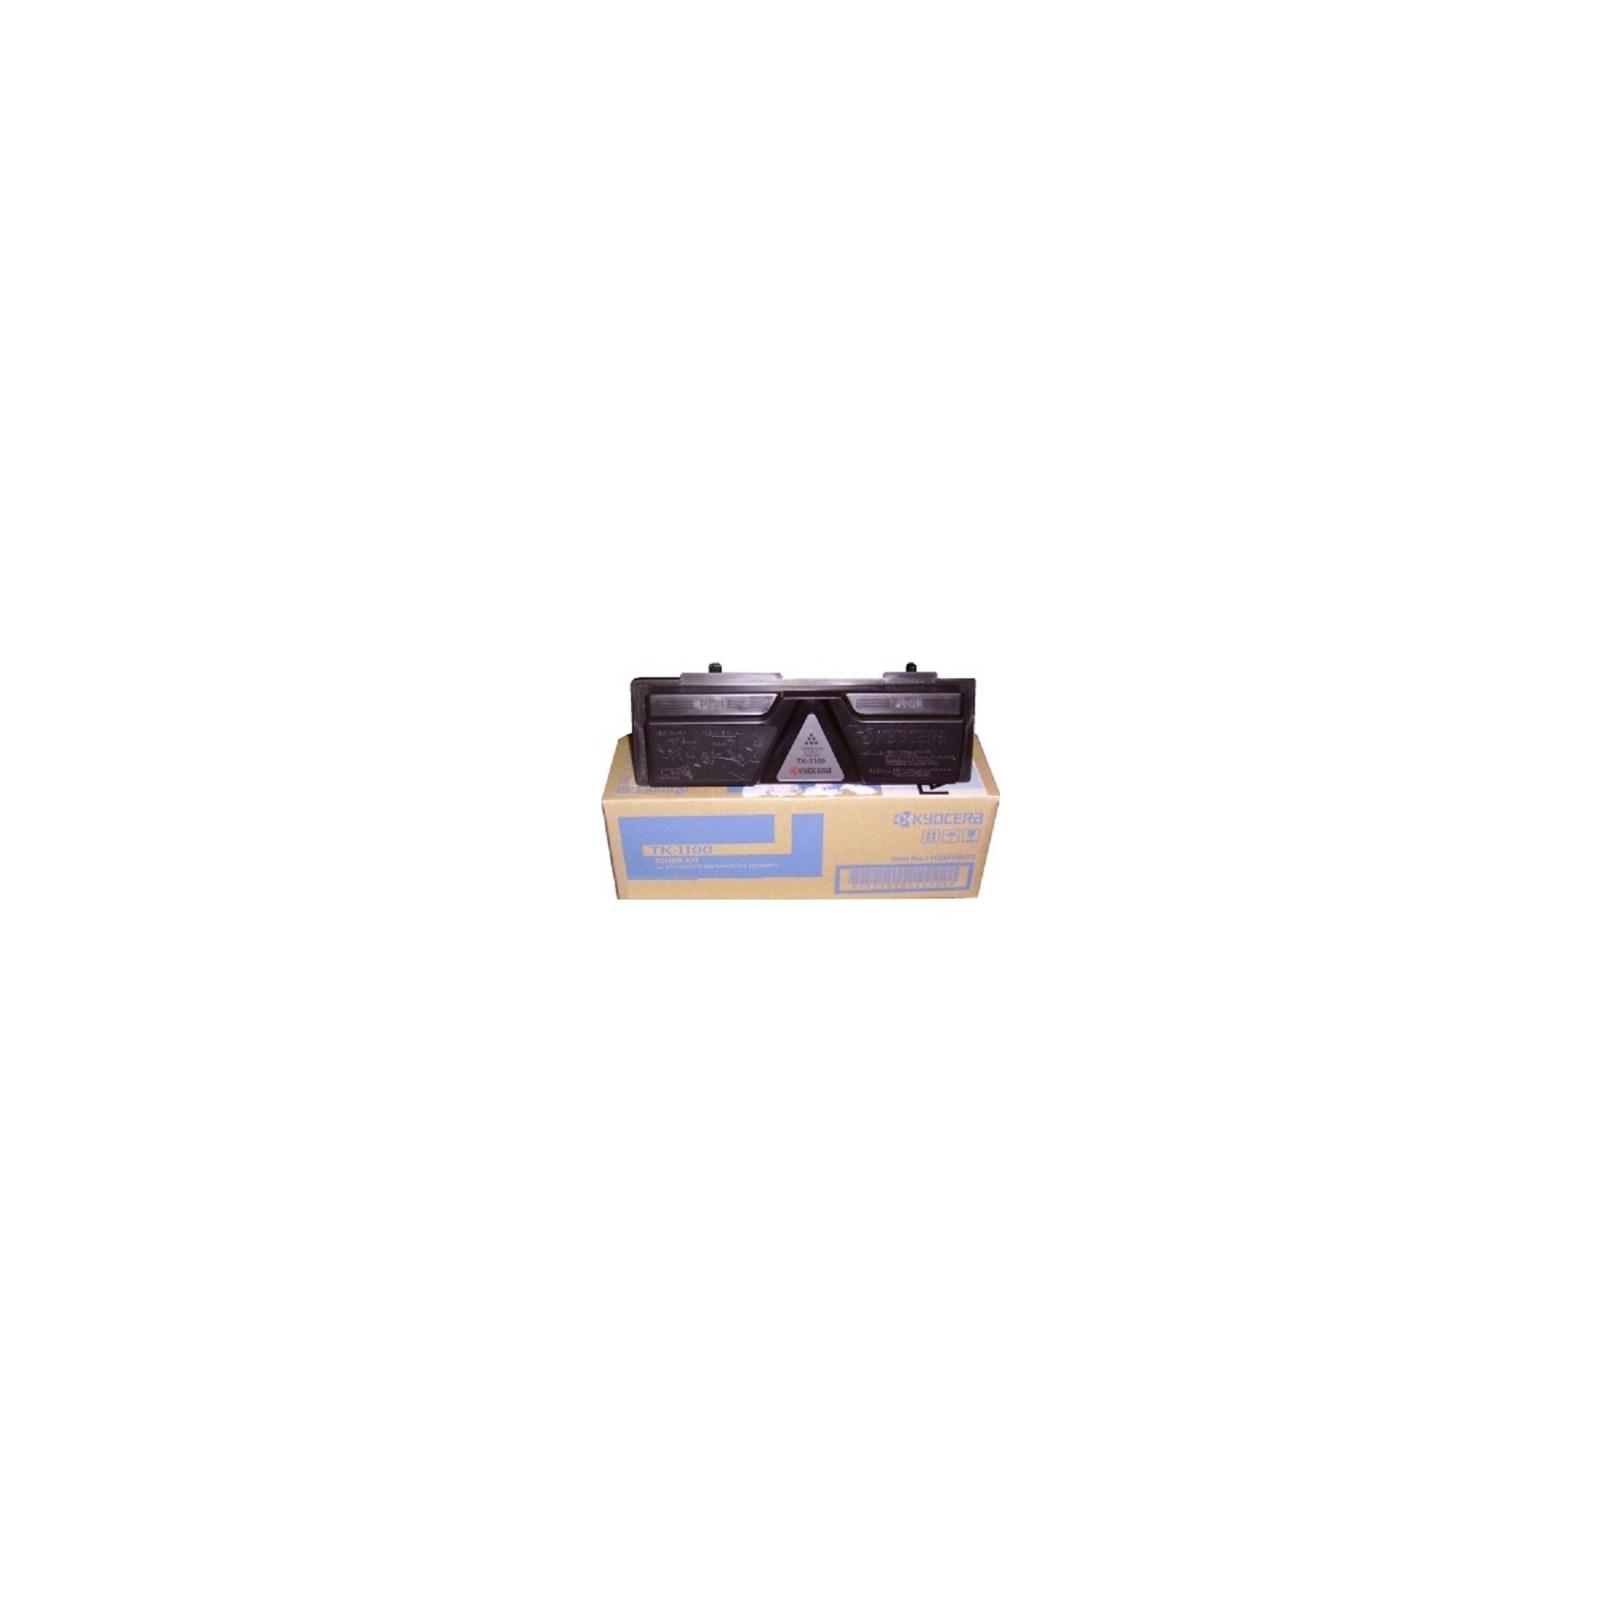 Тонер Kyocera TK-1100/1102 Integral (12100057)